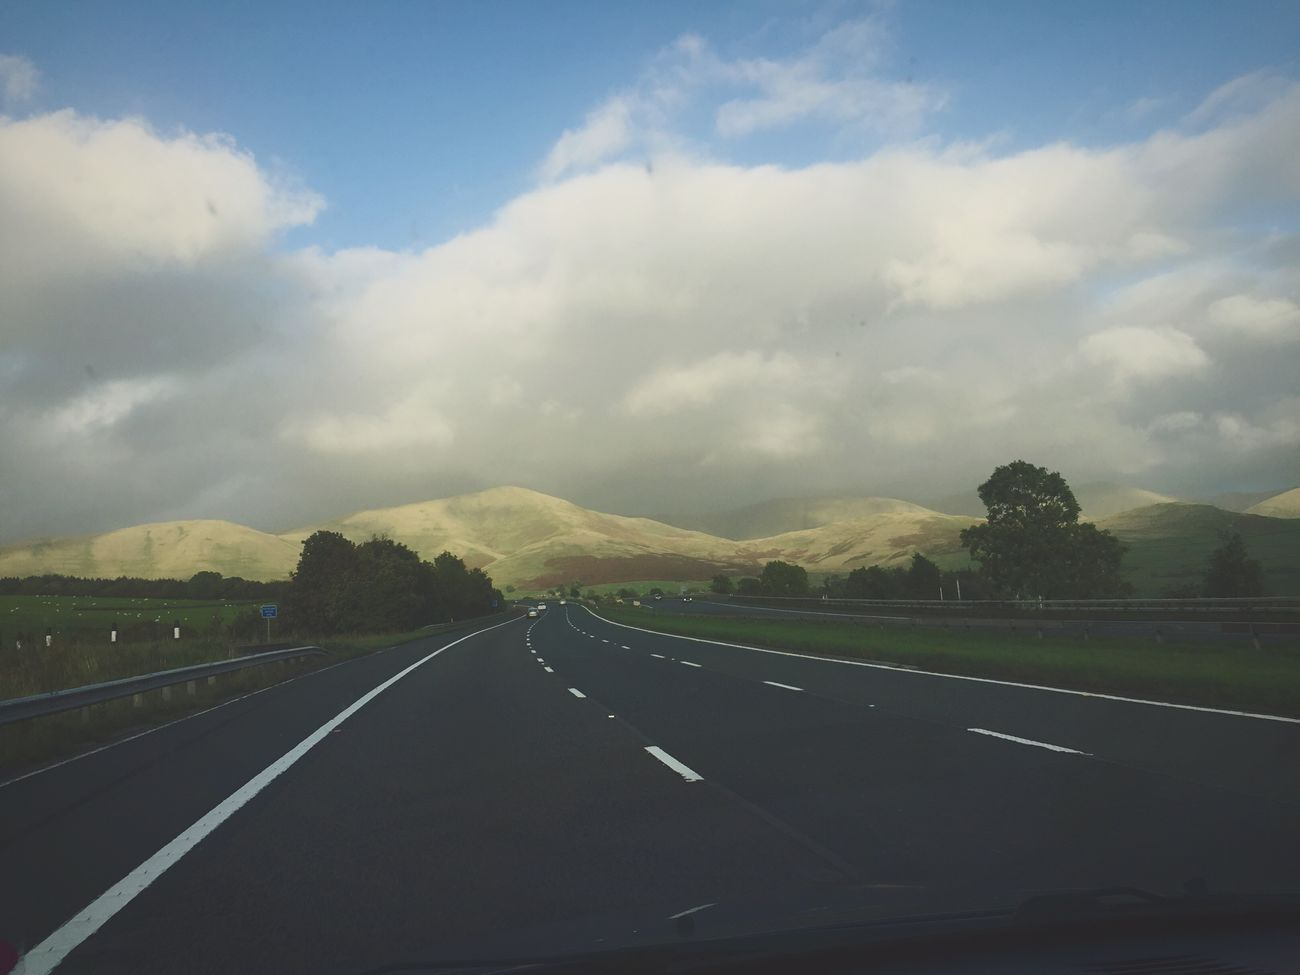 U.K. Road Trip Road Journey Hills Mountains Clear Sky Travel Destinations